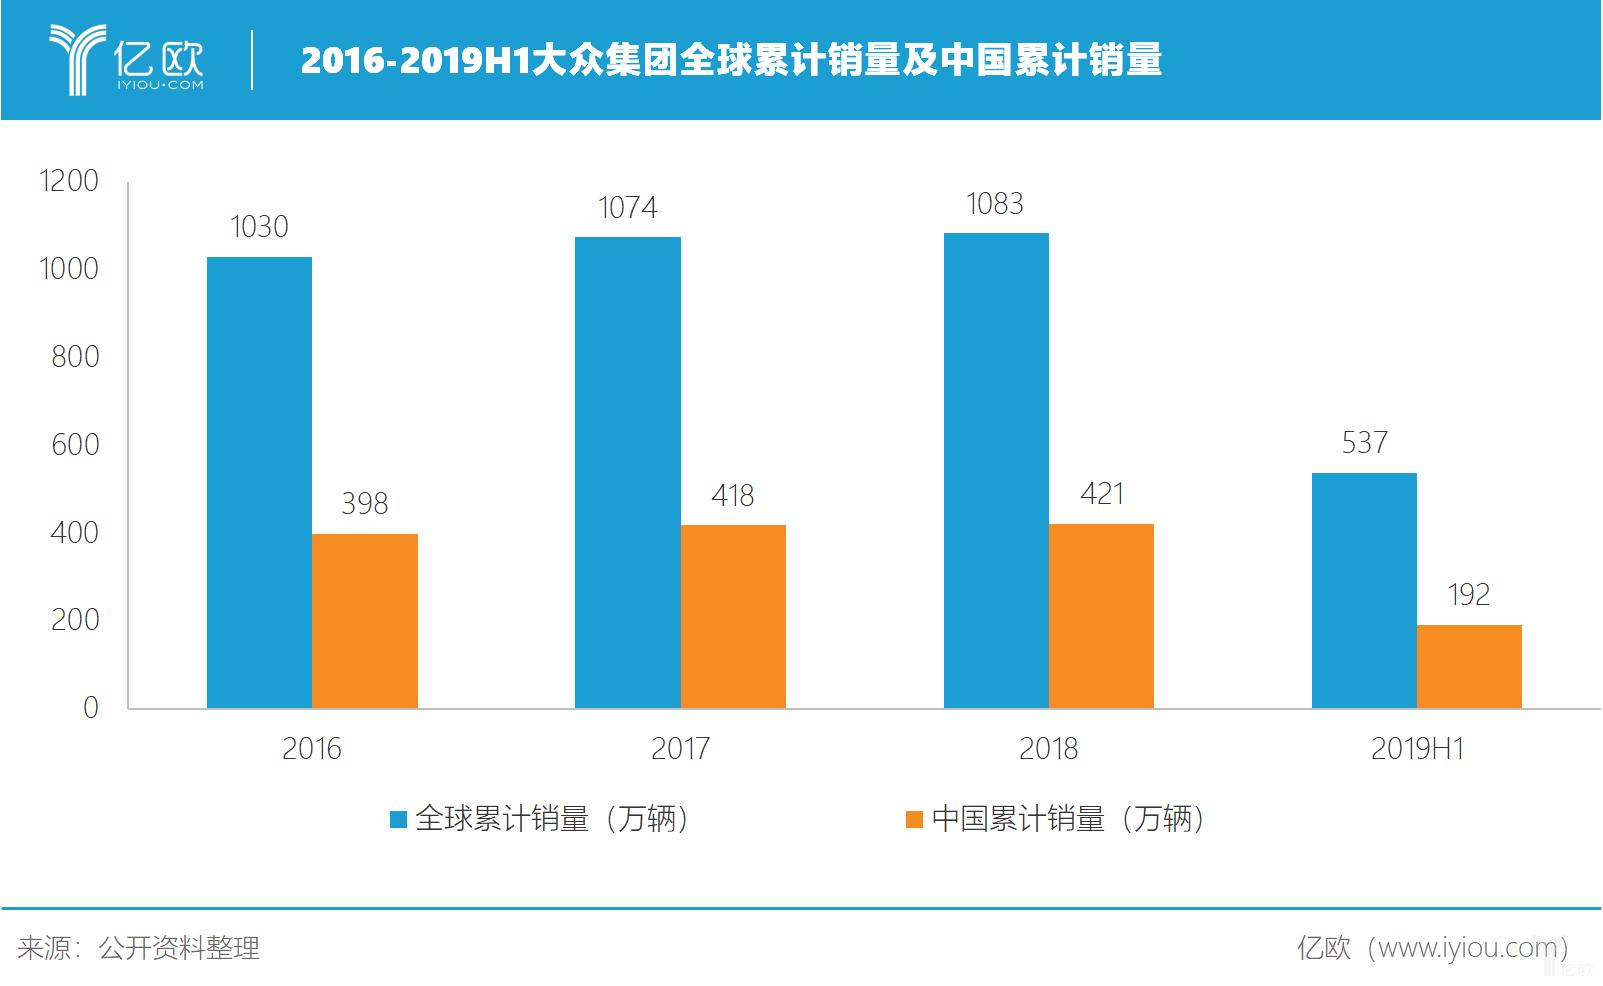 2016-2019H1大眾集團全球累計銷量及中國累計銷量